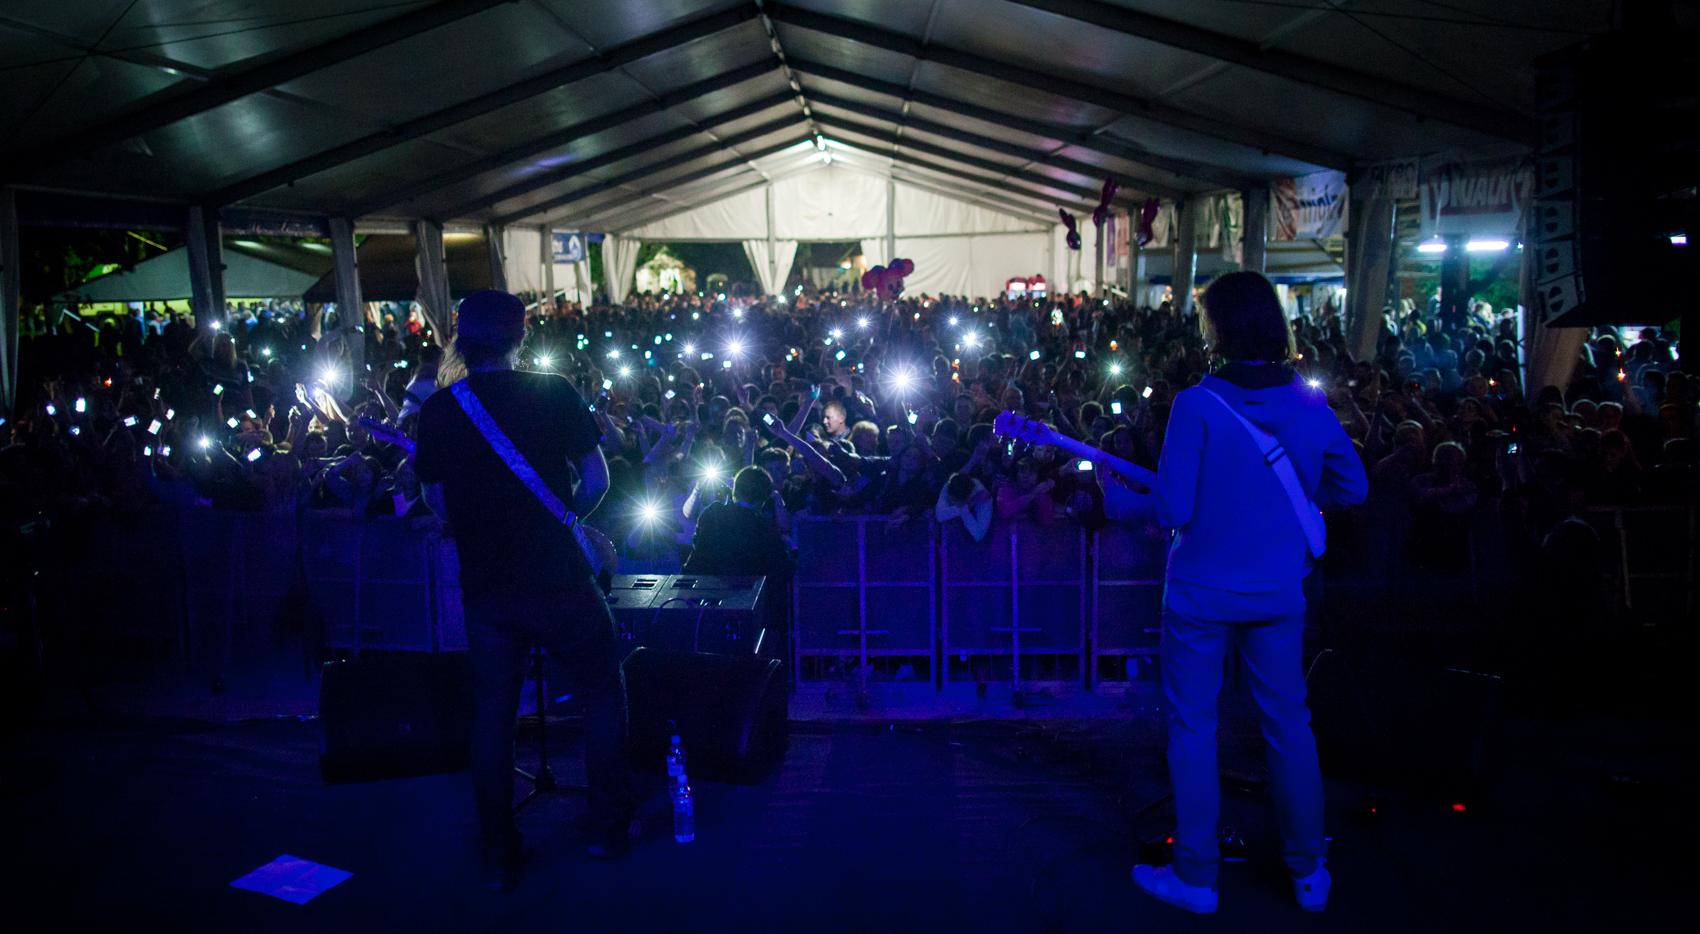 Festival FlosFest